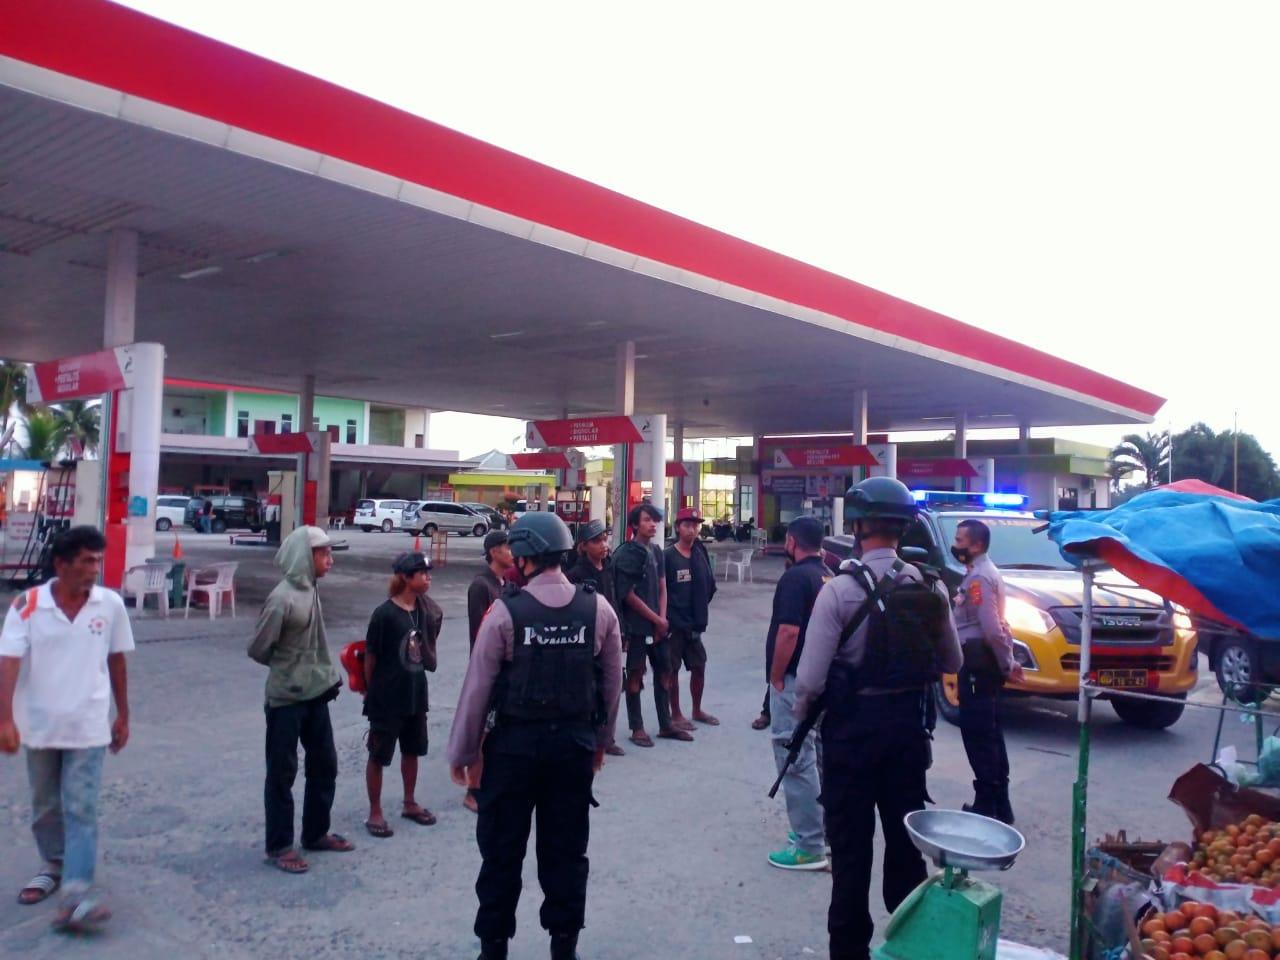 Terima laporan masyarakat, Sat Sabhara polres Aceh Utara sigap tertibkan Anak punk